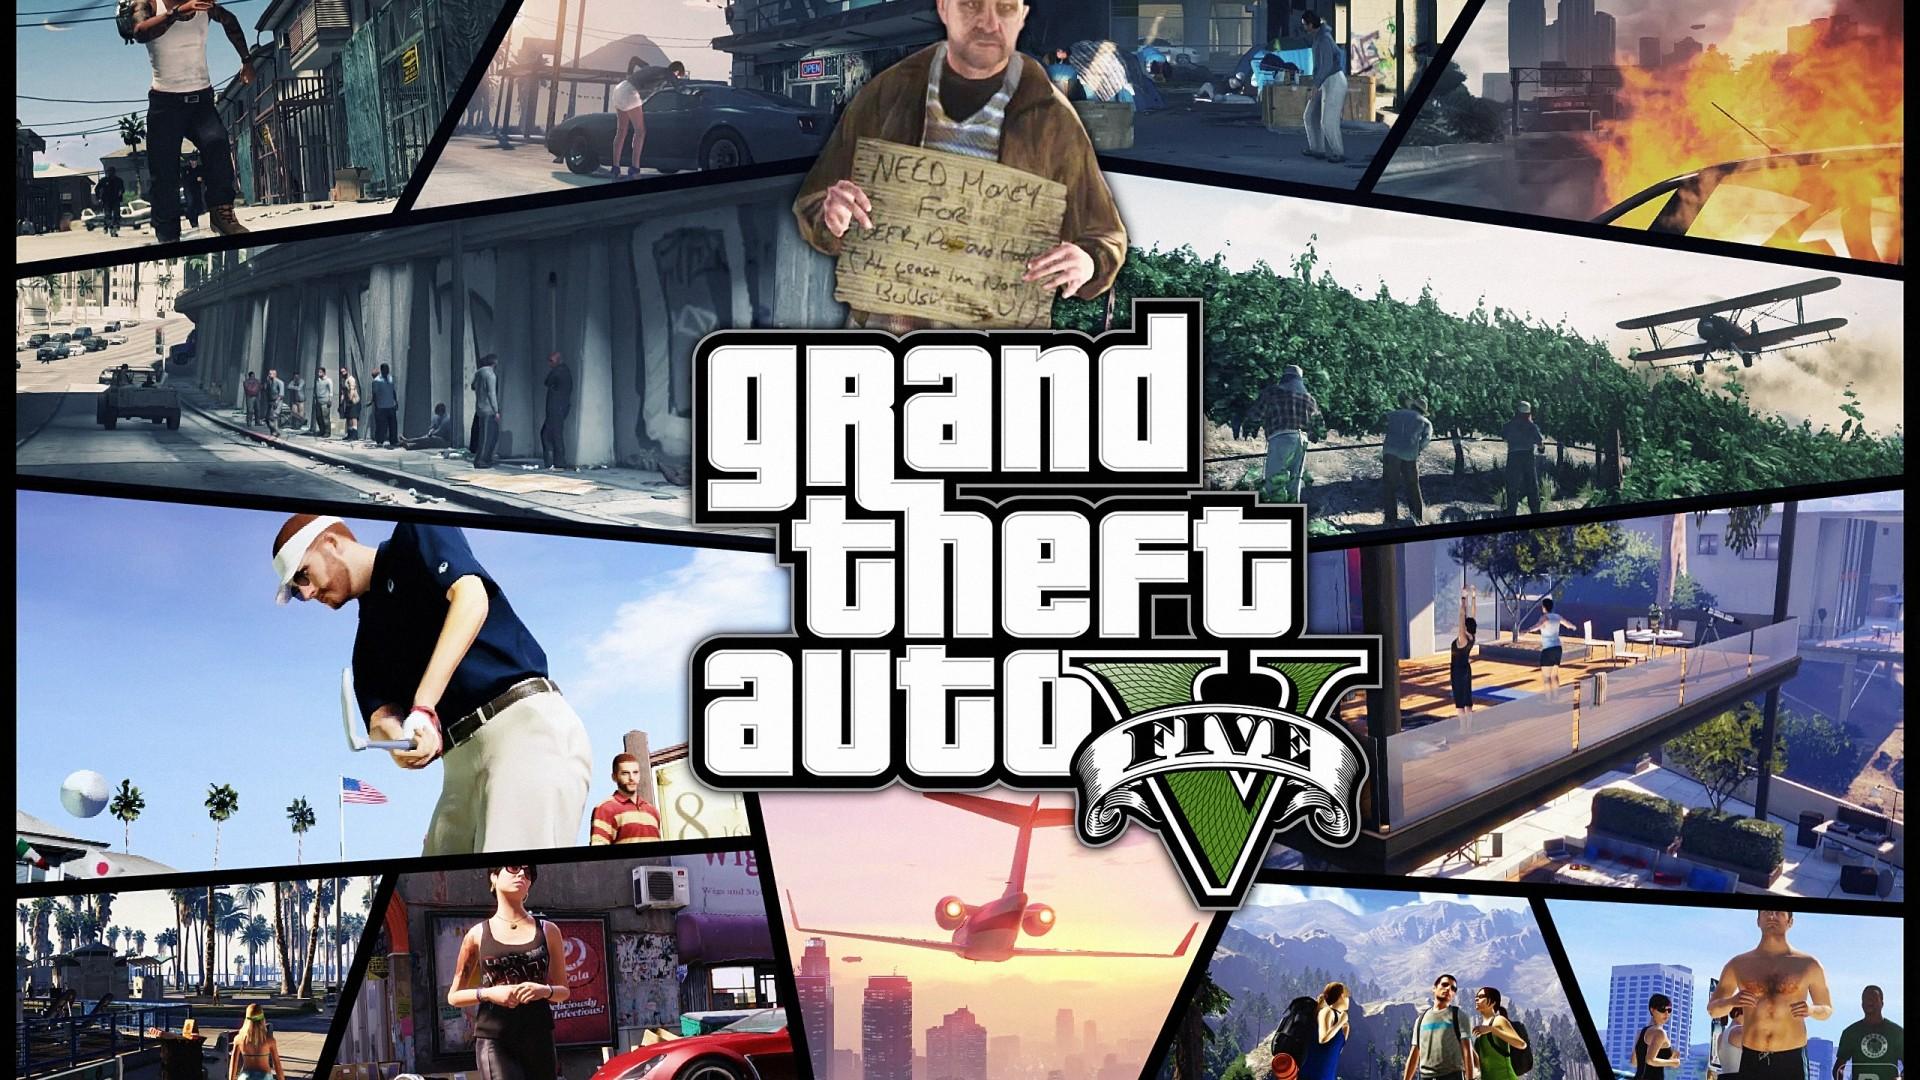 Grand Theft Auto 5 wallpaper 8